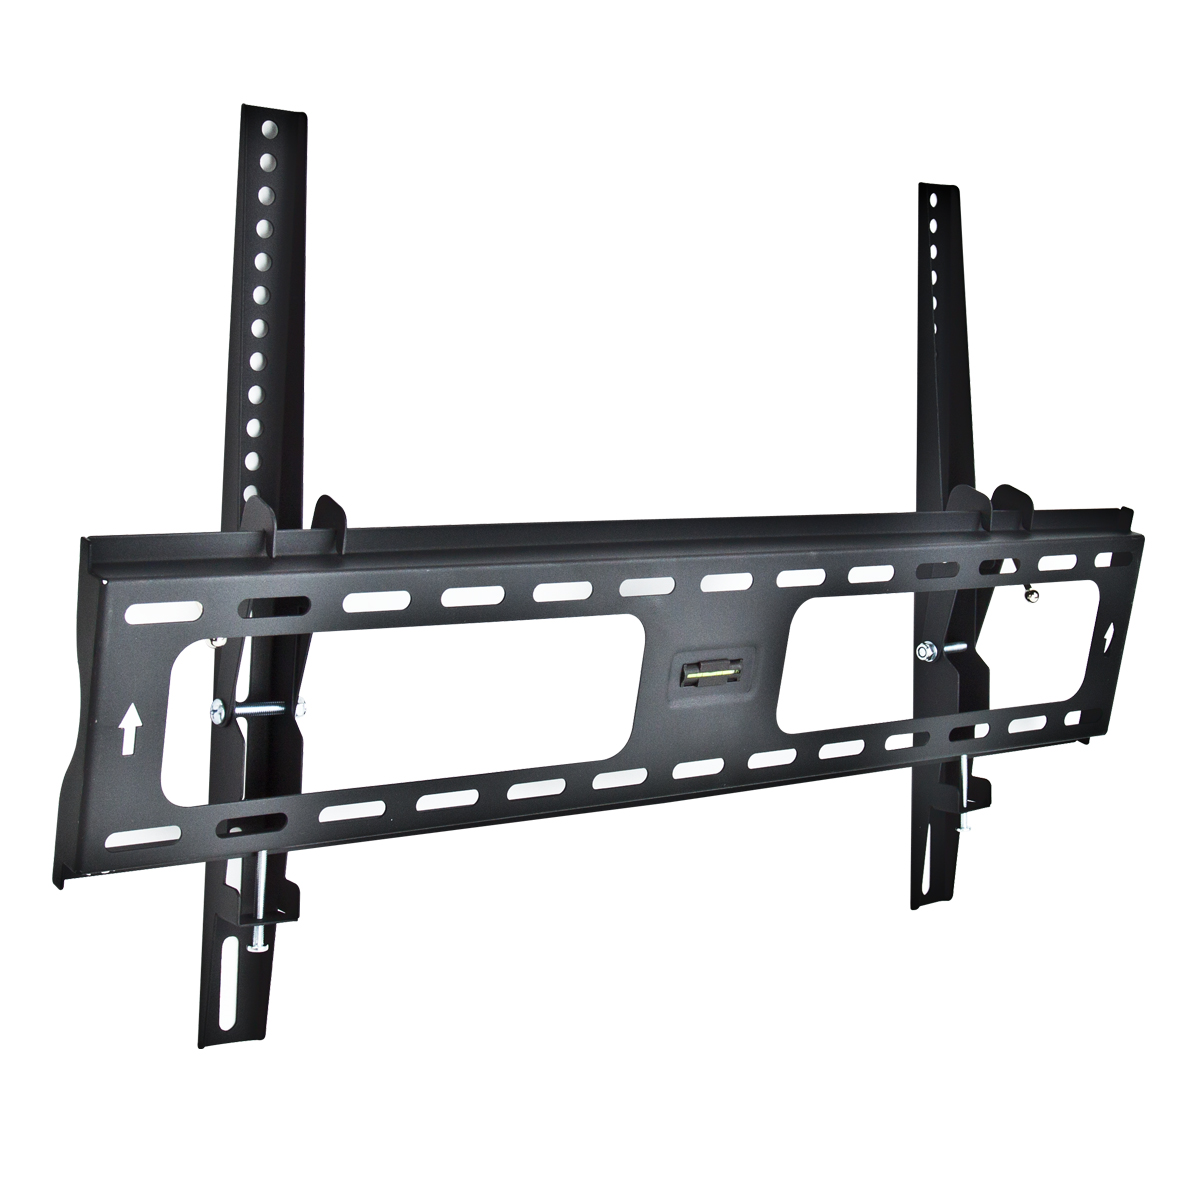 2 universal tilt tv wall mount flat screen bracket 30 60 lcd led plasma hdtv ebay. Black Bedroom Furniture Sets. Home Design Ideas